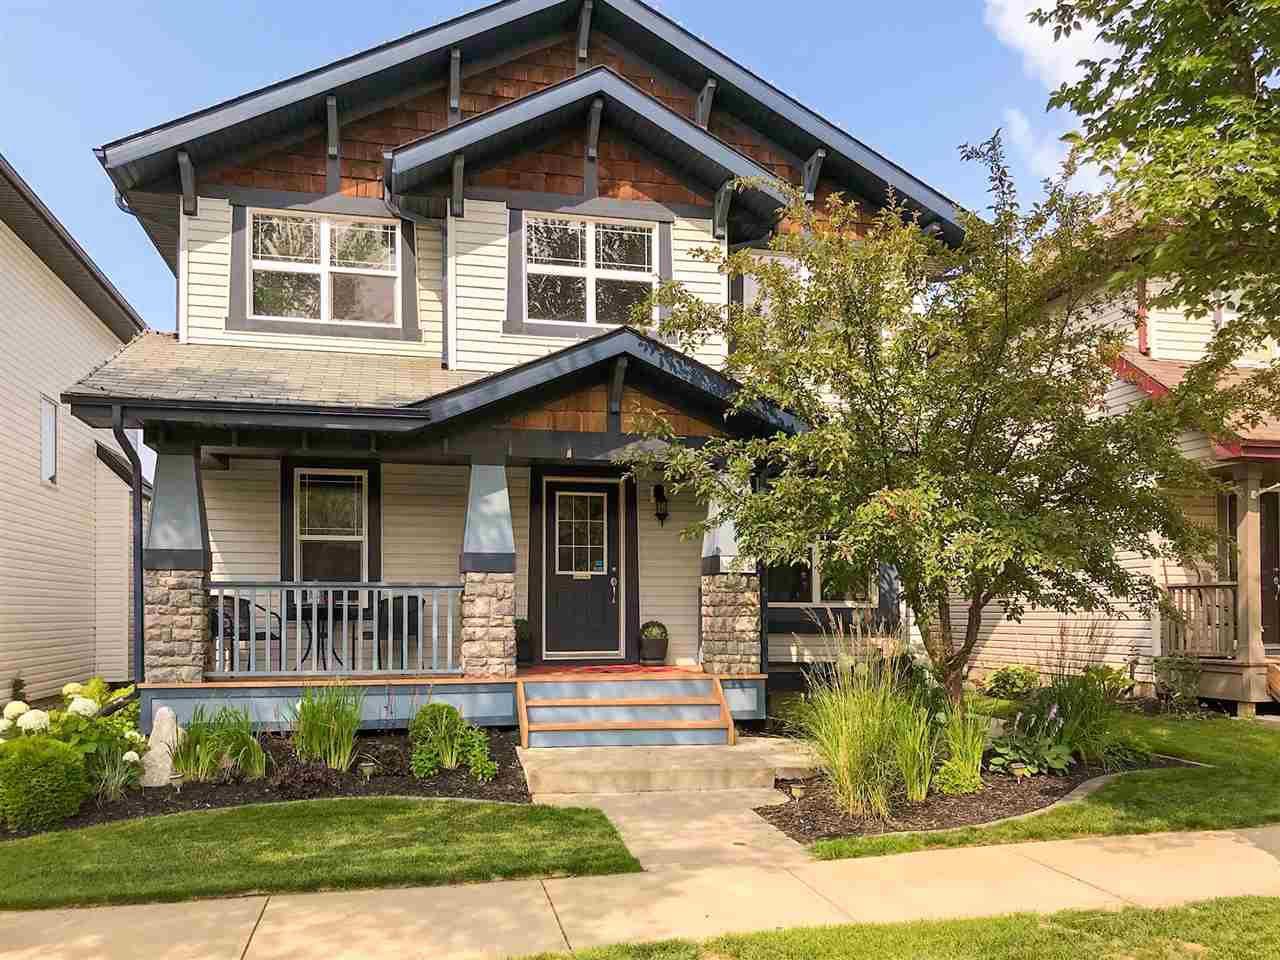 Main Photo: 1818 Towne Center Boulevard in Edmonton: Zone 14 House for sale : MLS®# E4154173